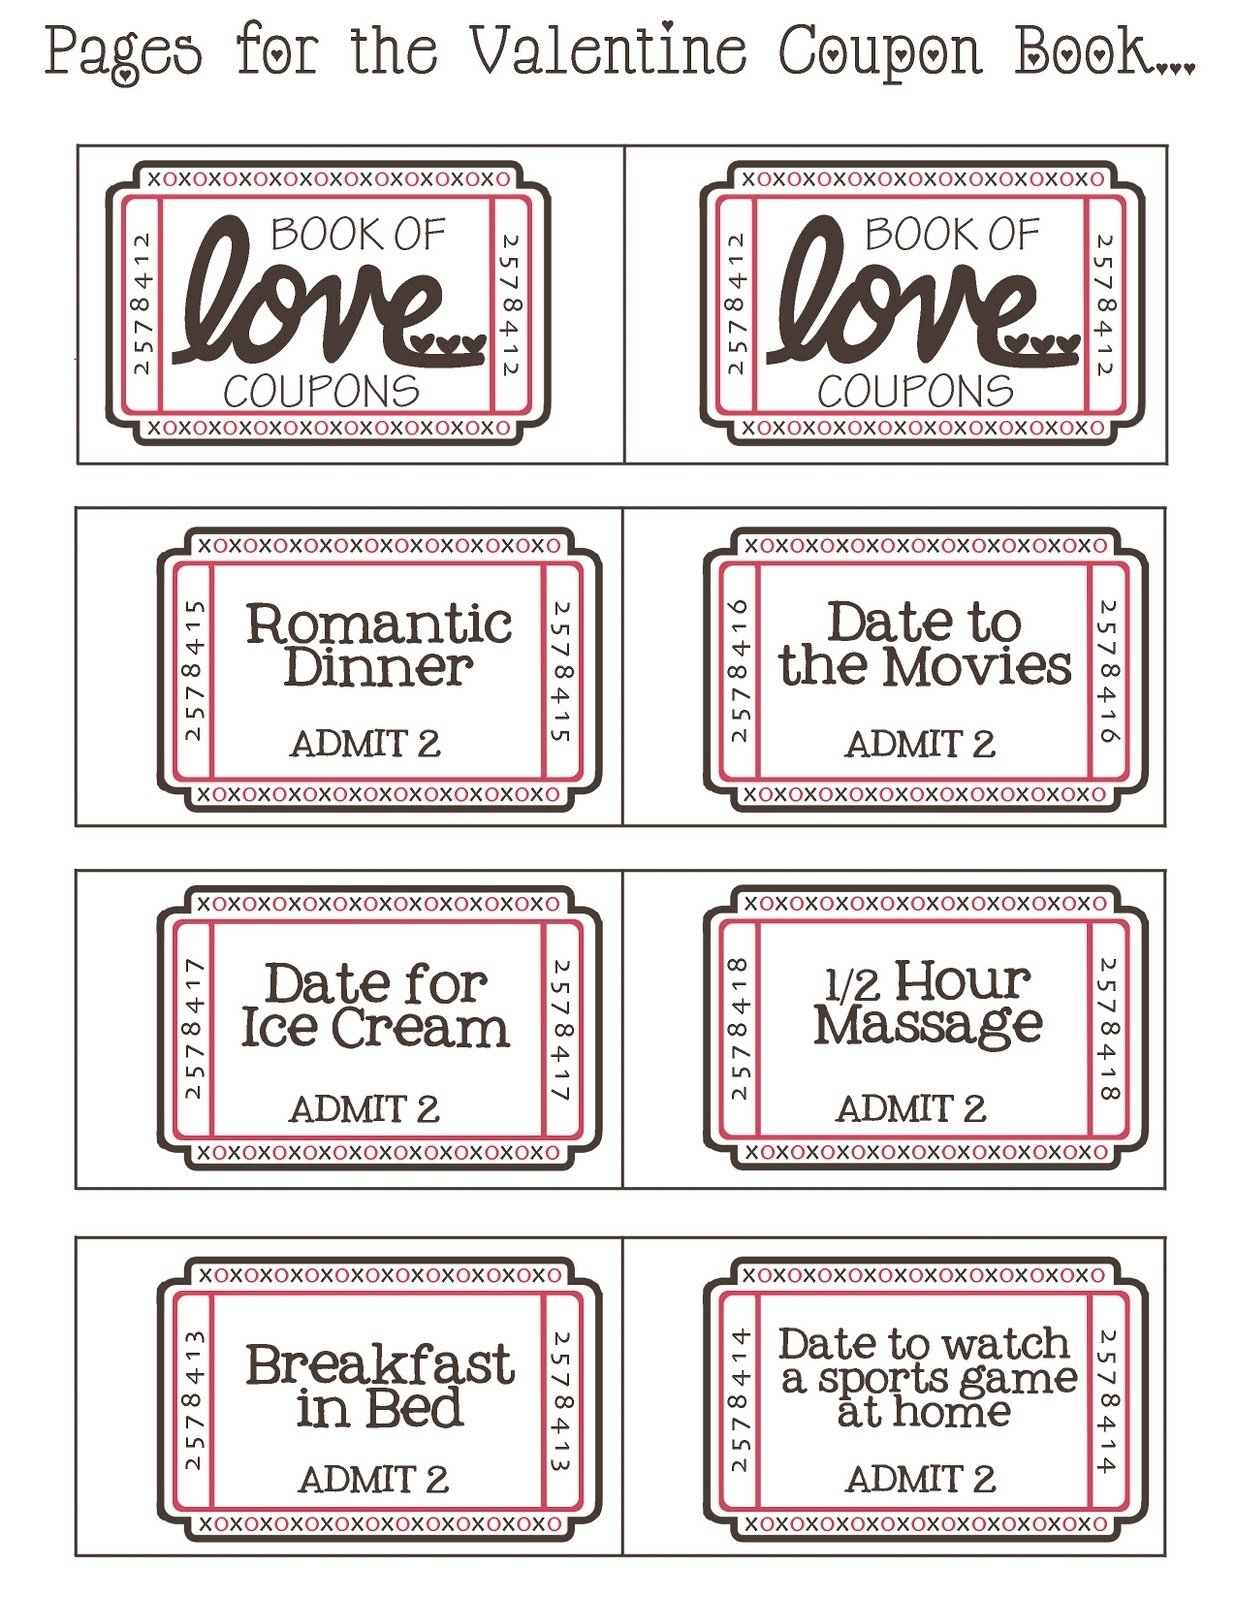 10 Unique Coupon Book Ideas For Husband lover coupon book neuer monoberlin co 2021